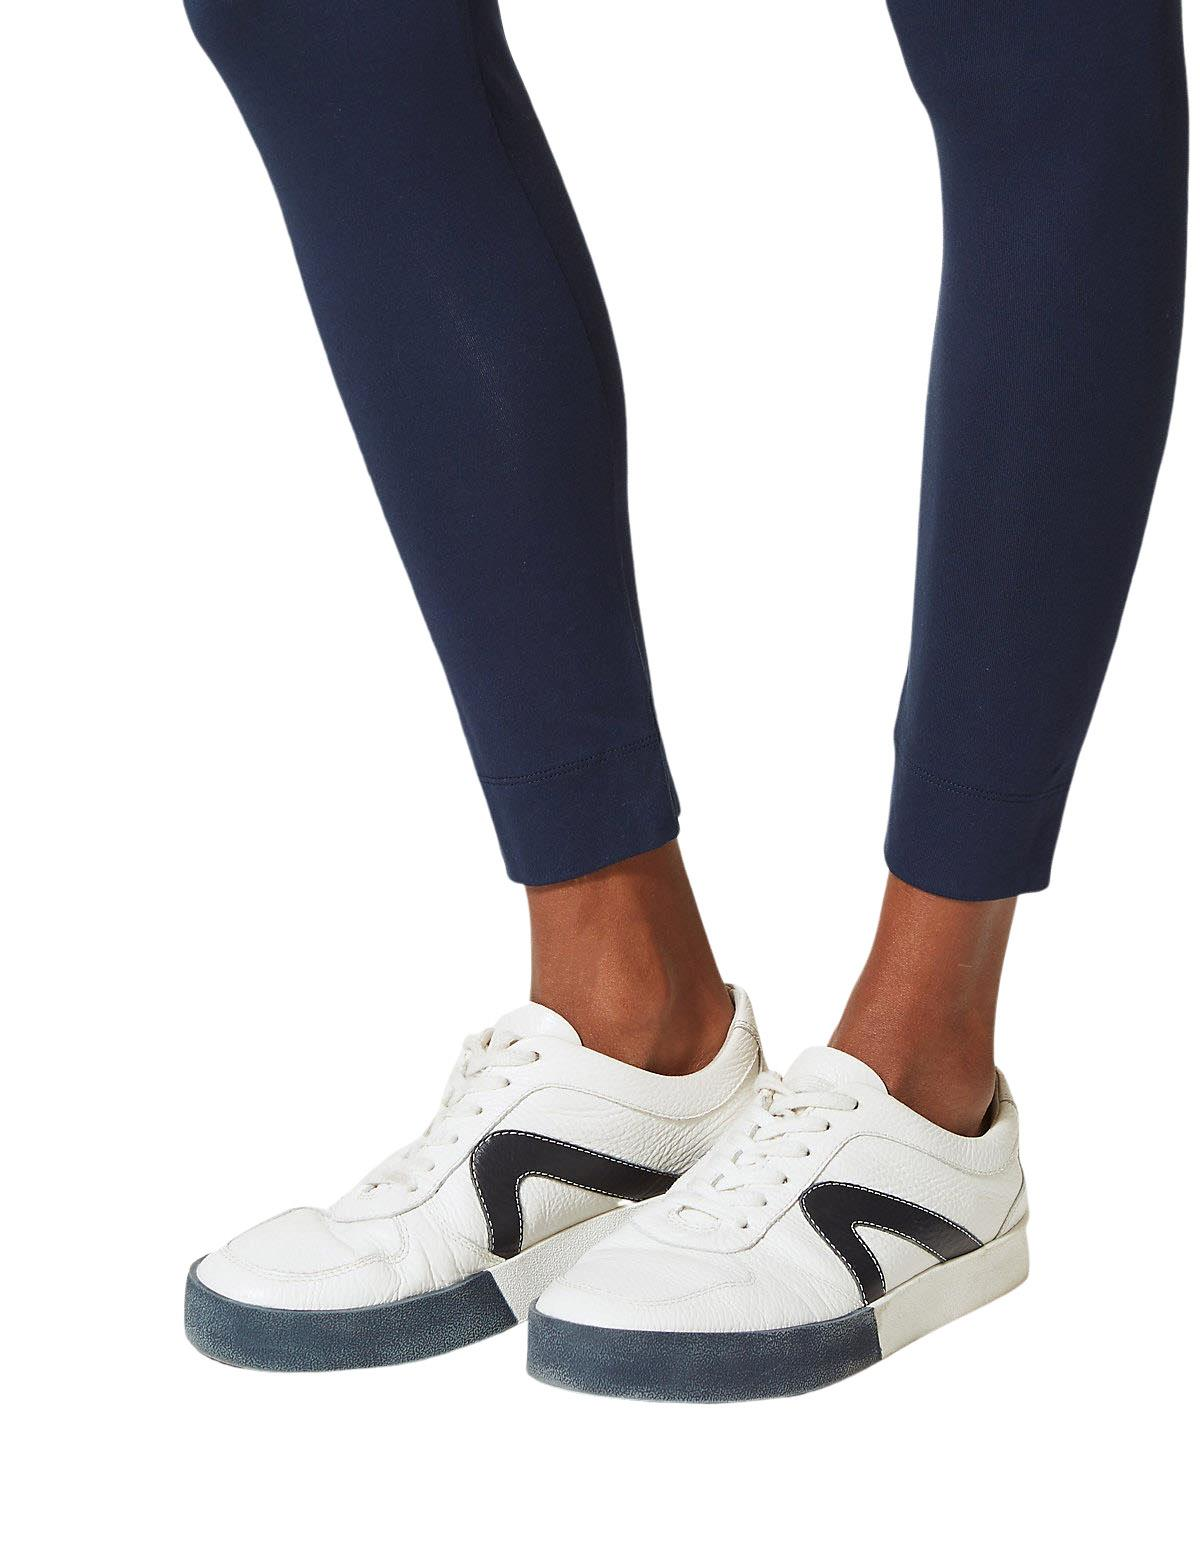 Ex-M-amp-S-Leggings-Azul-marino-Berry-Gris-Carbon-Negro-Marks-amp-Spencer-Talla-6-24 miniatura 25